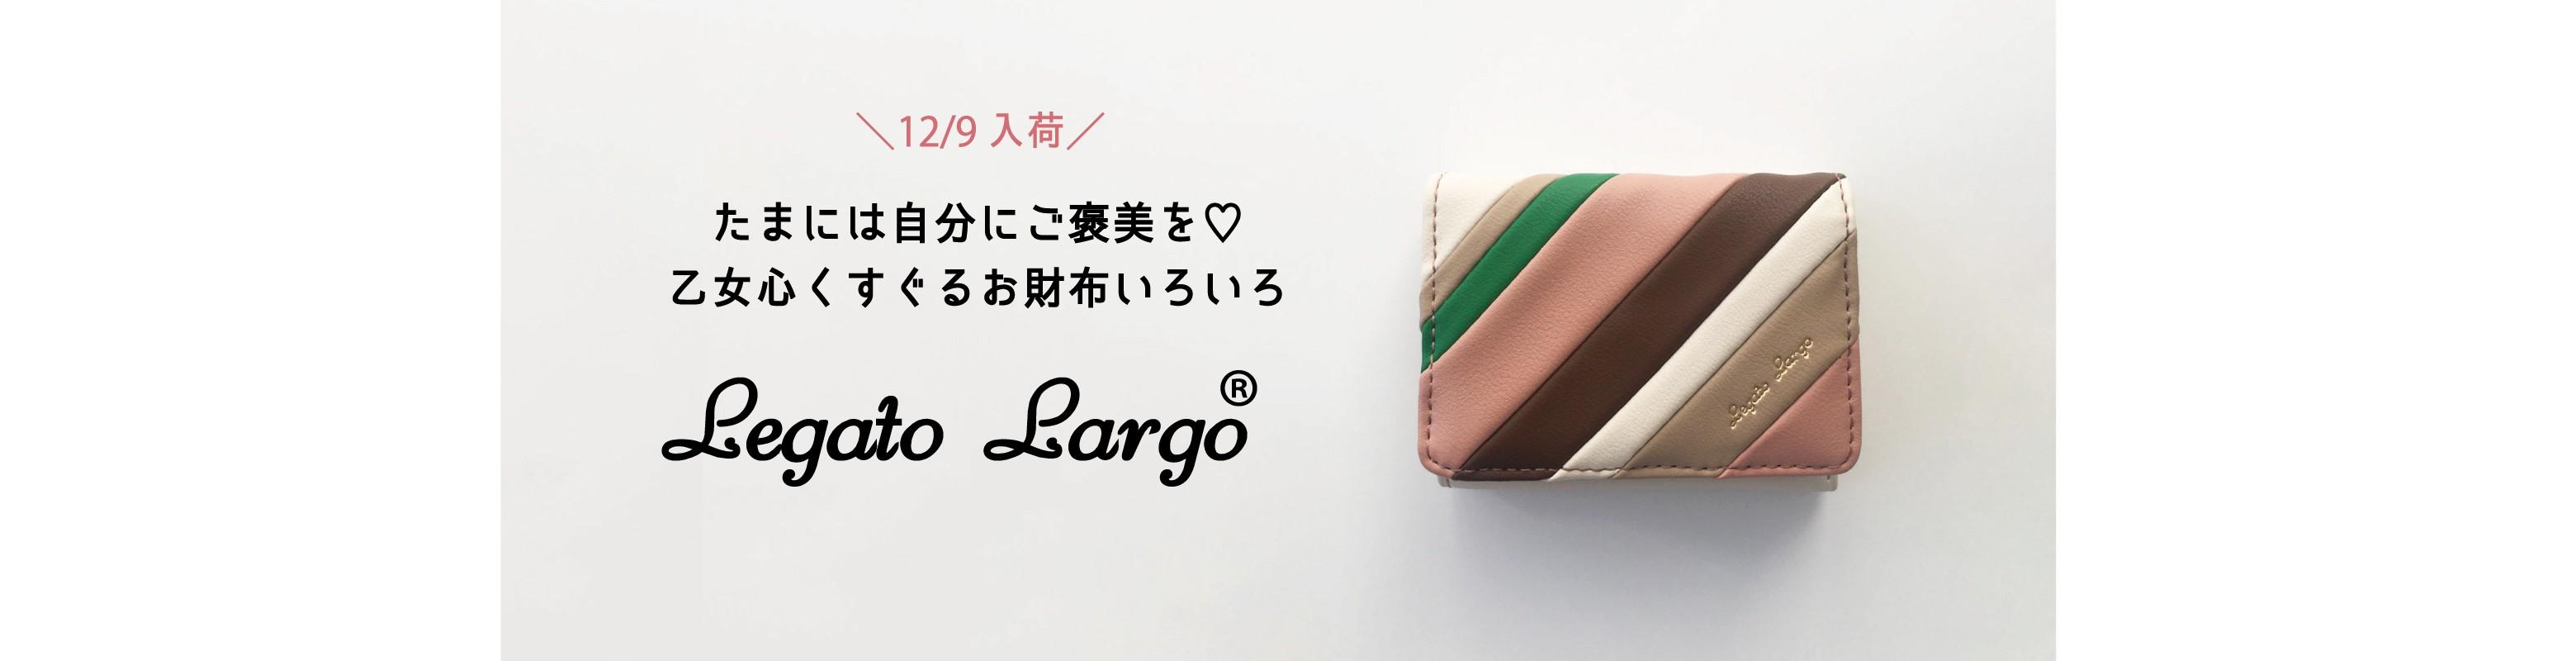 \12/9UP/Legato Largo入荷しました!